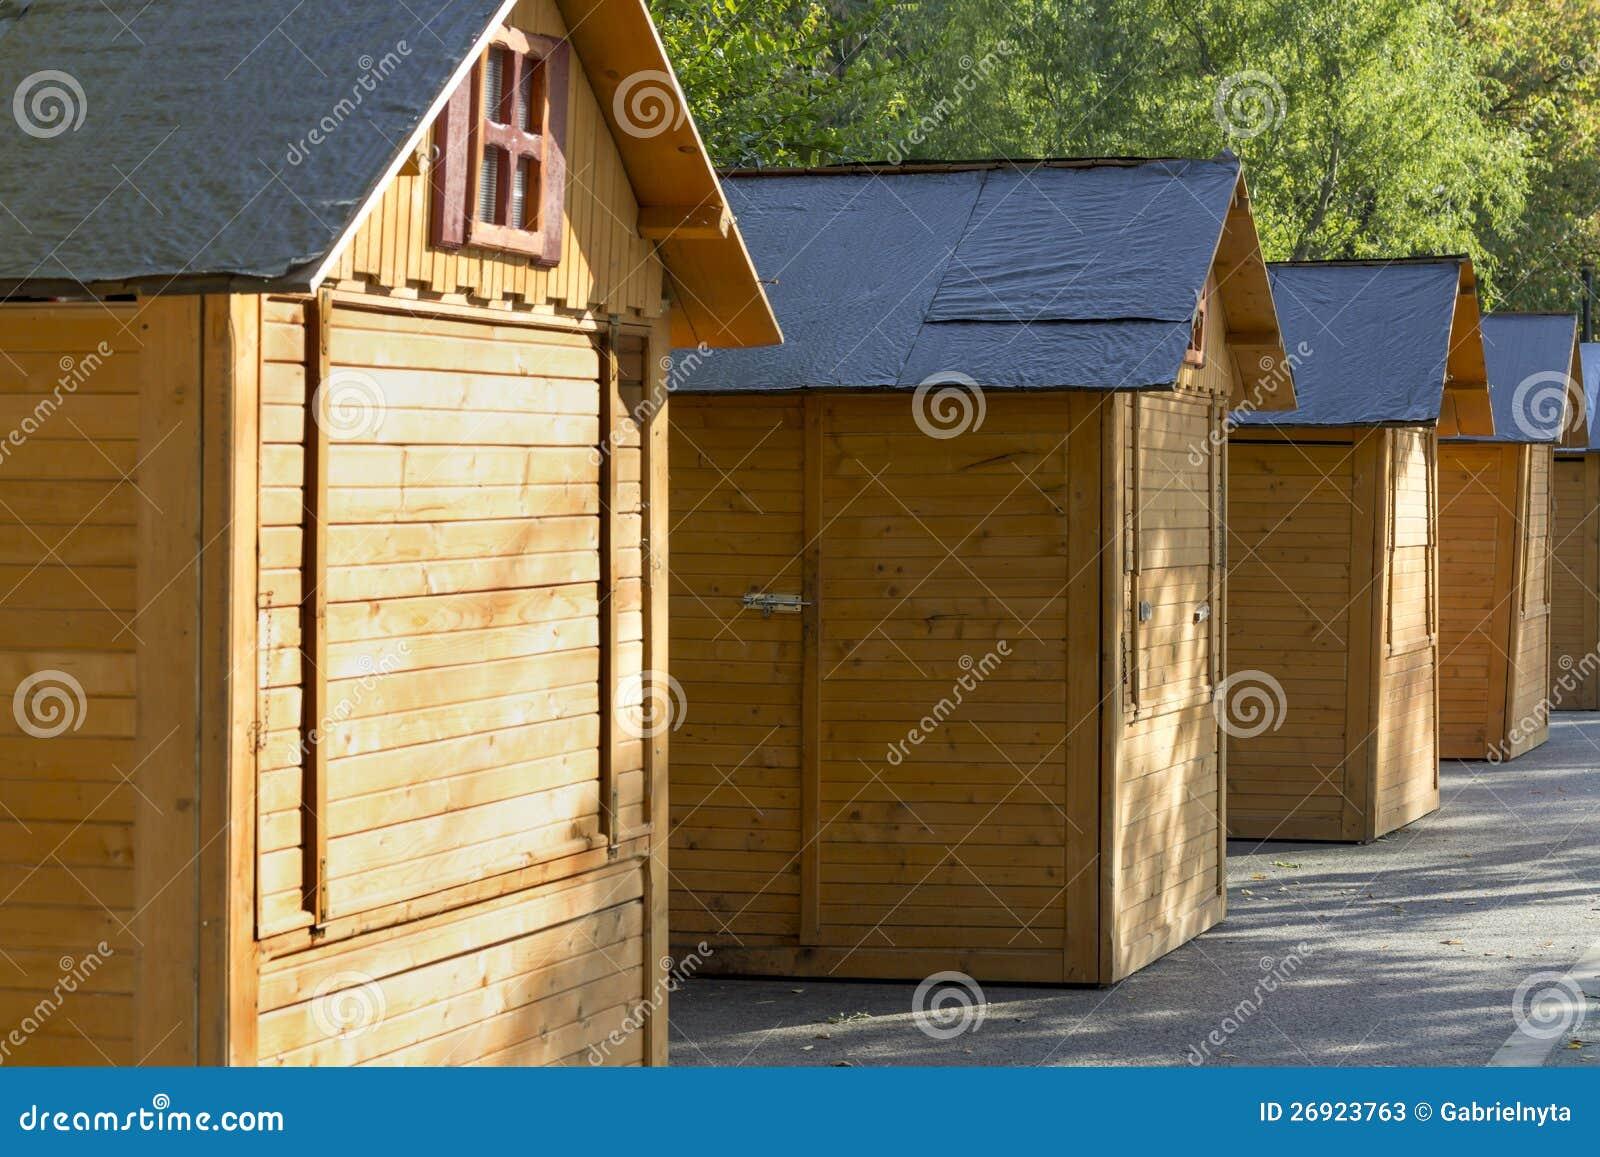 Peque as casas de madera fotos de archivo imagen 26923763 - Casas de madera pequenas ...